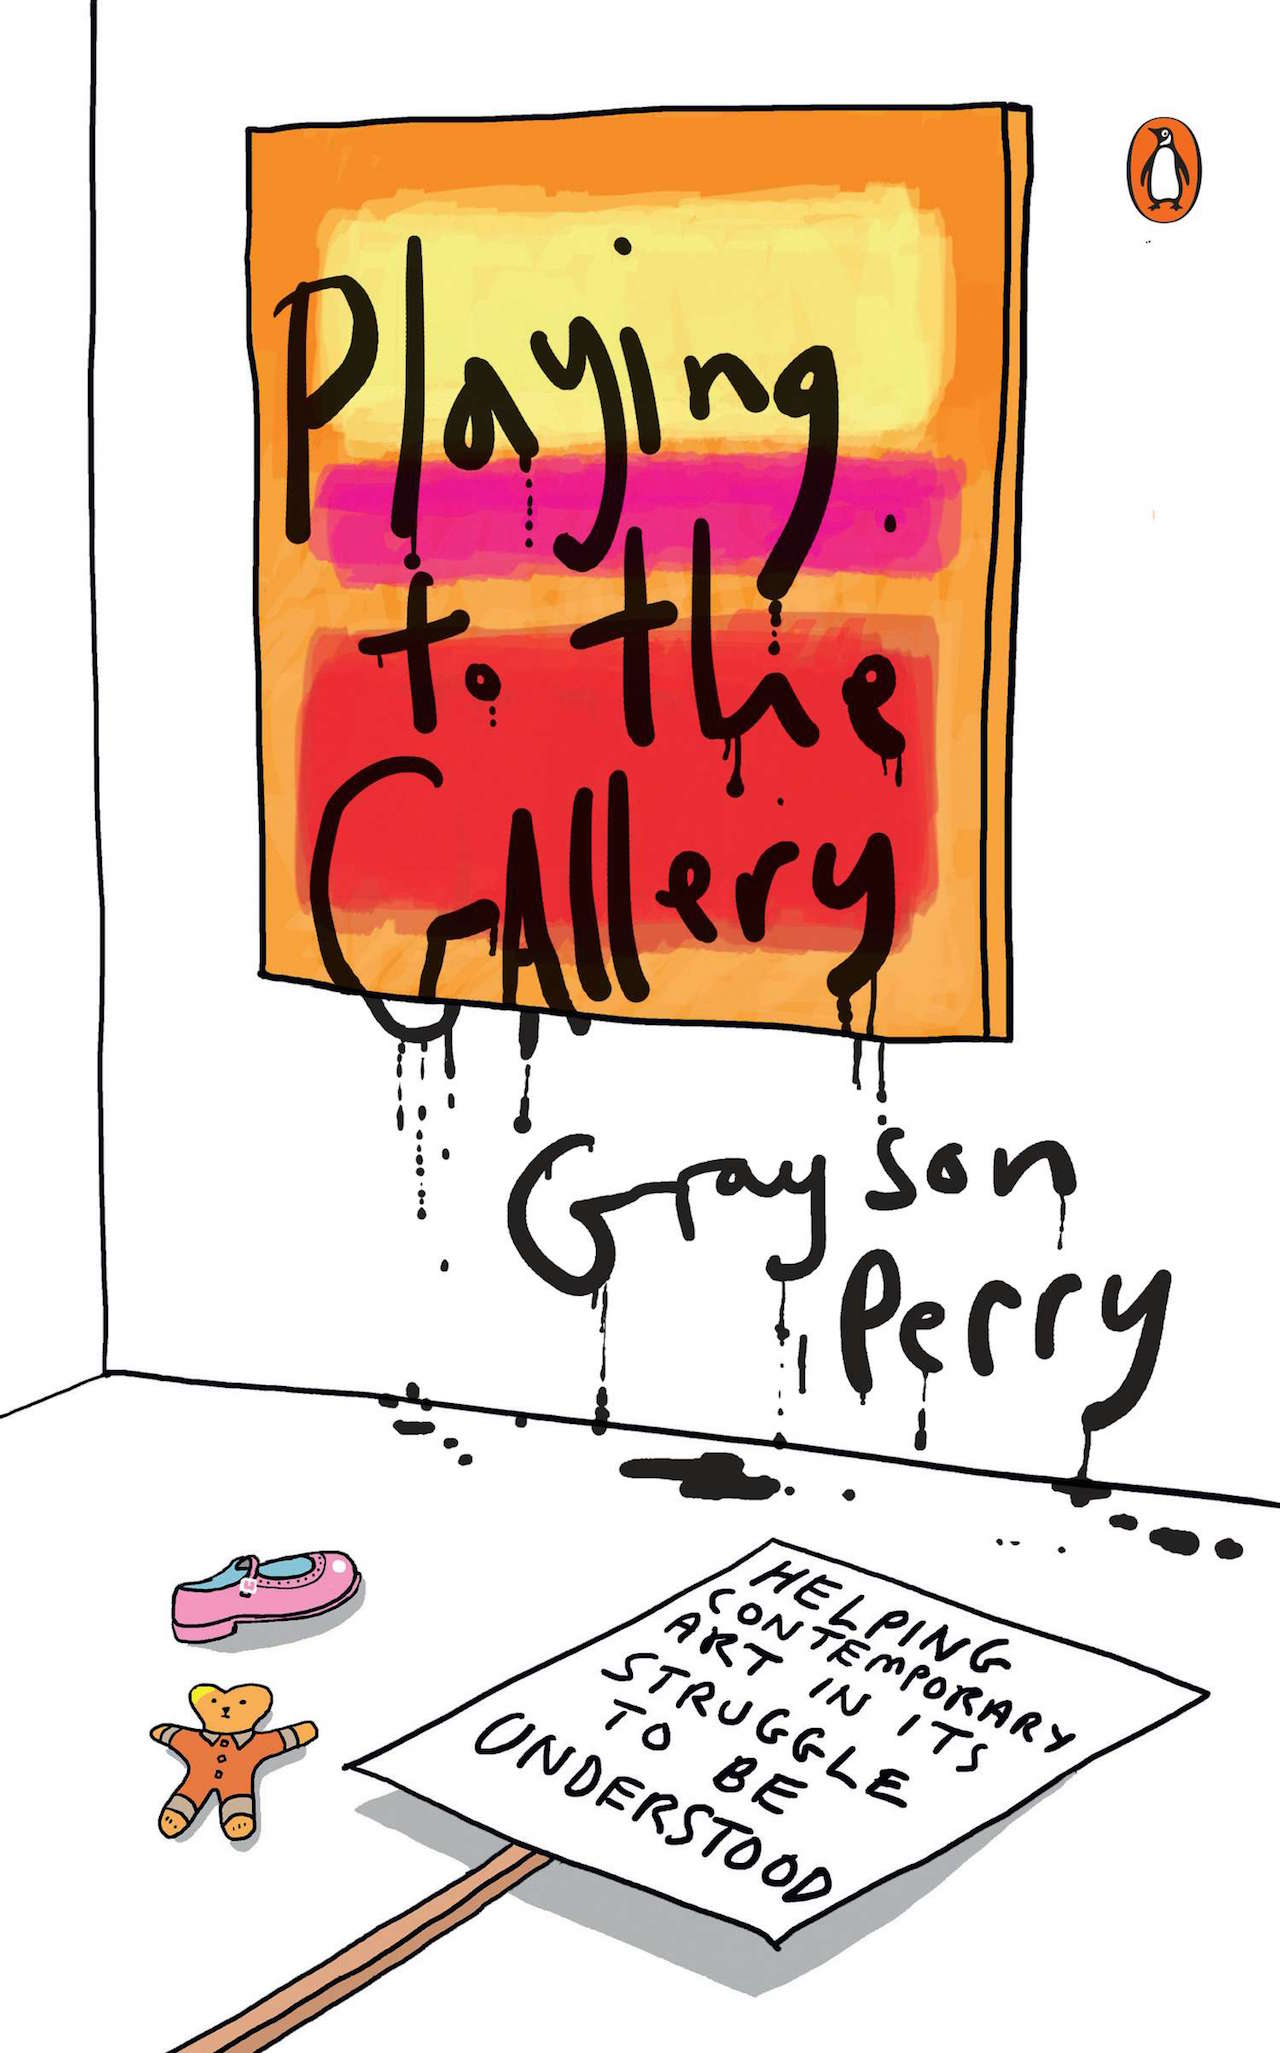 Grayson Perry's Art World 101